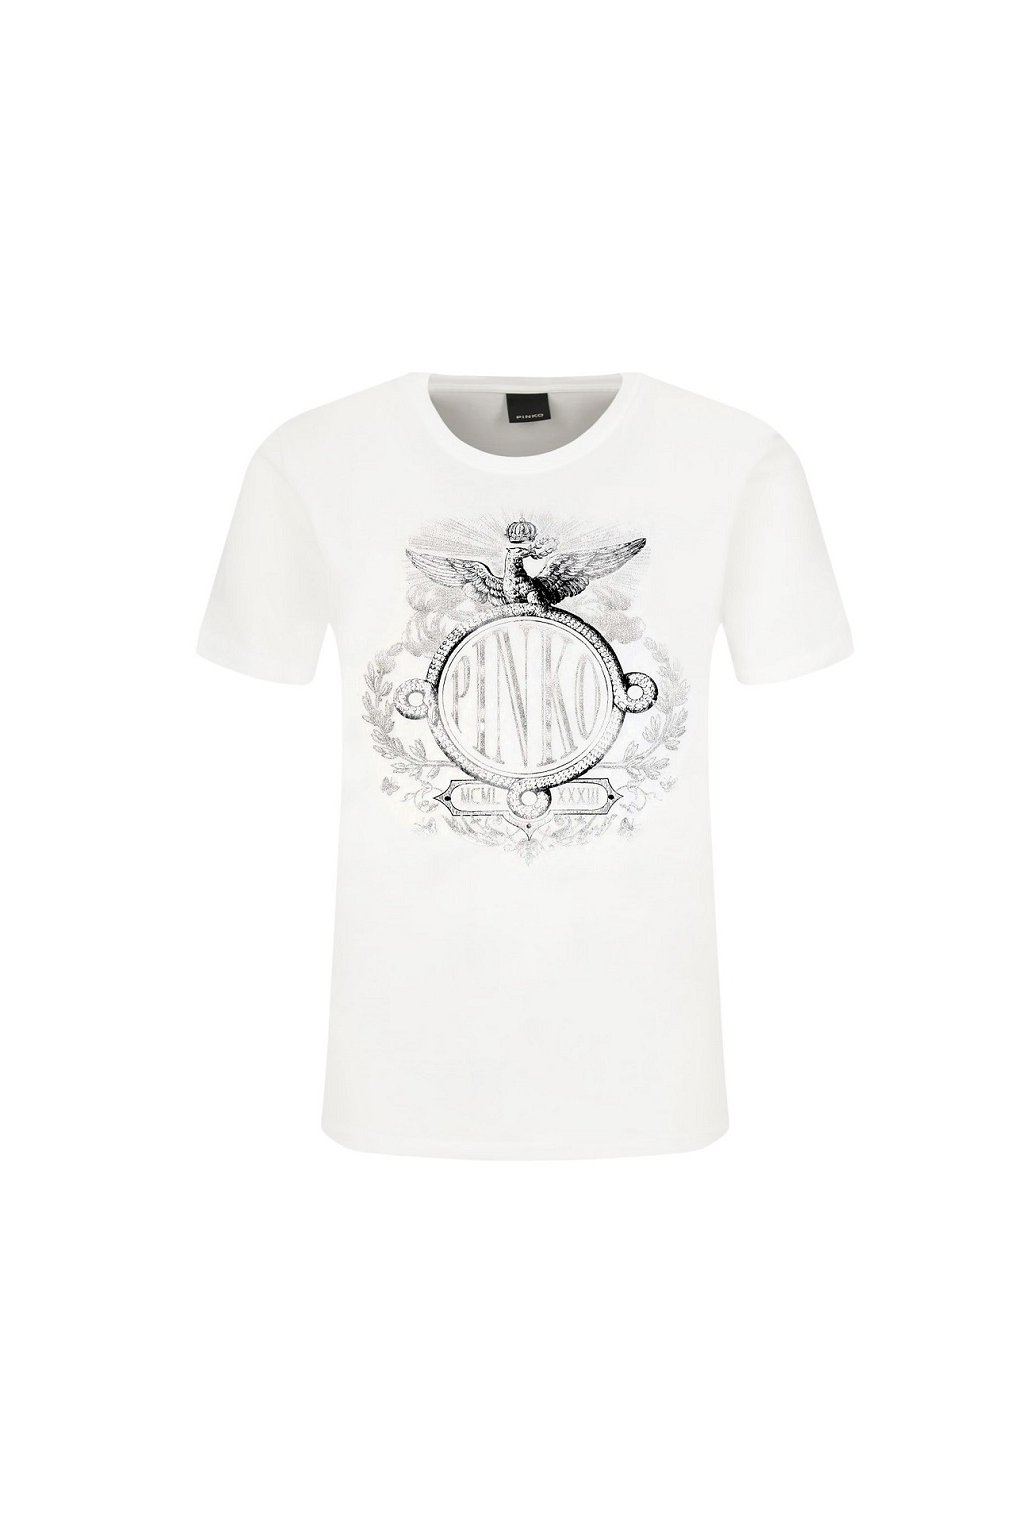 1G15B4 Y651 Dámské tričko Pinko Demetrio bílé